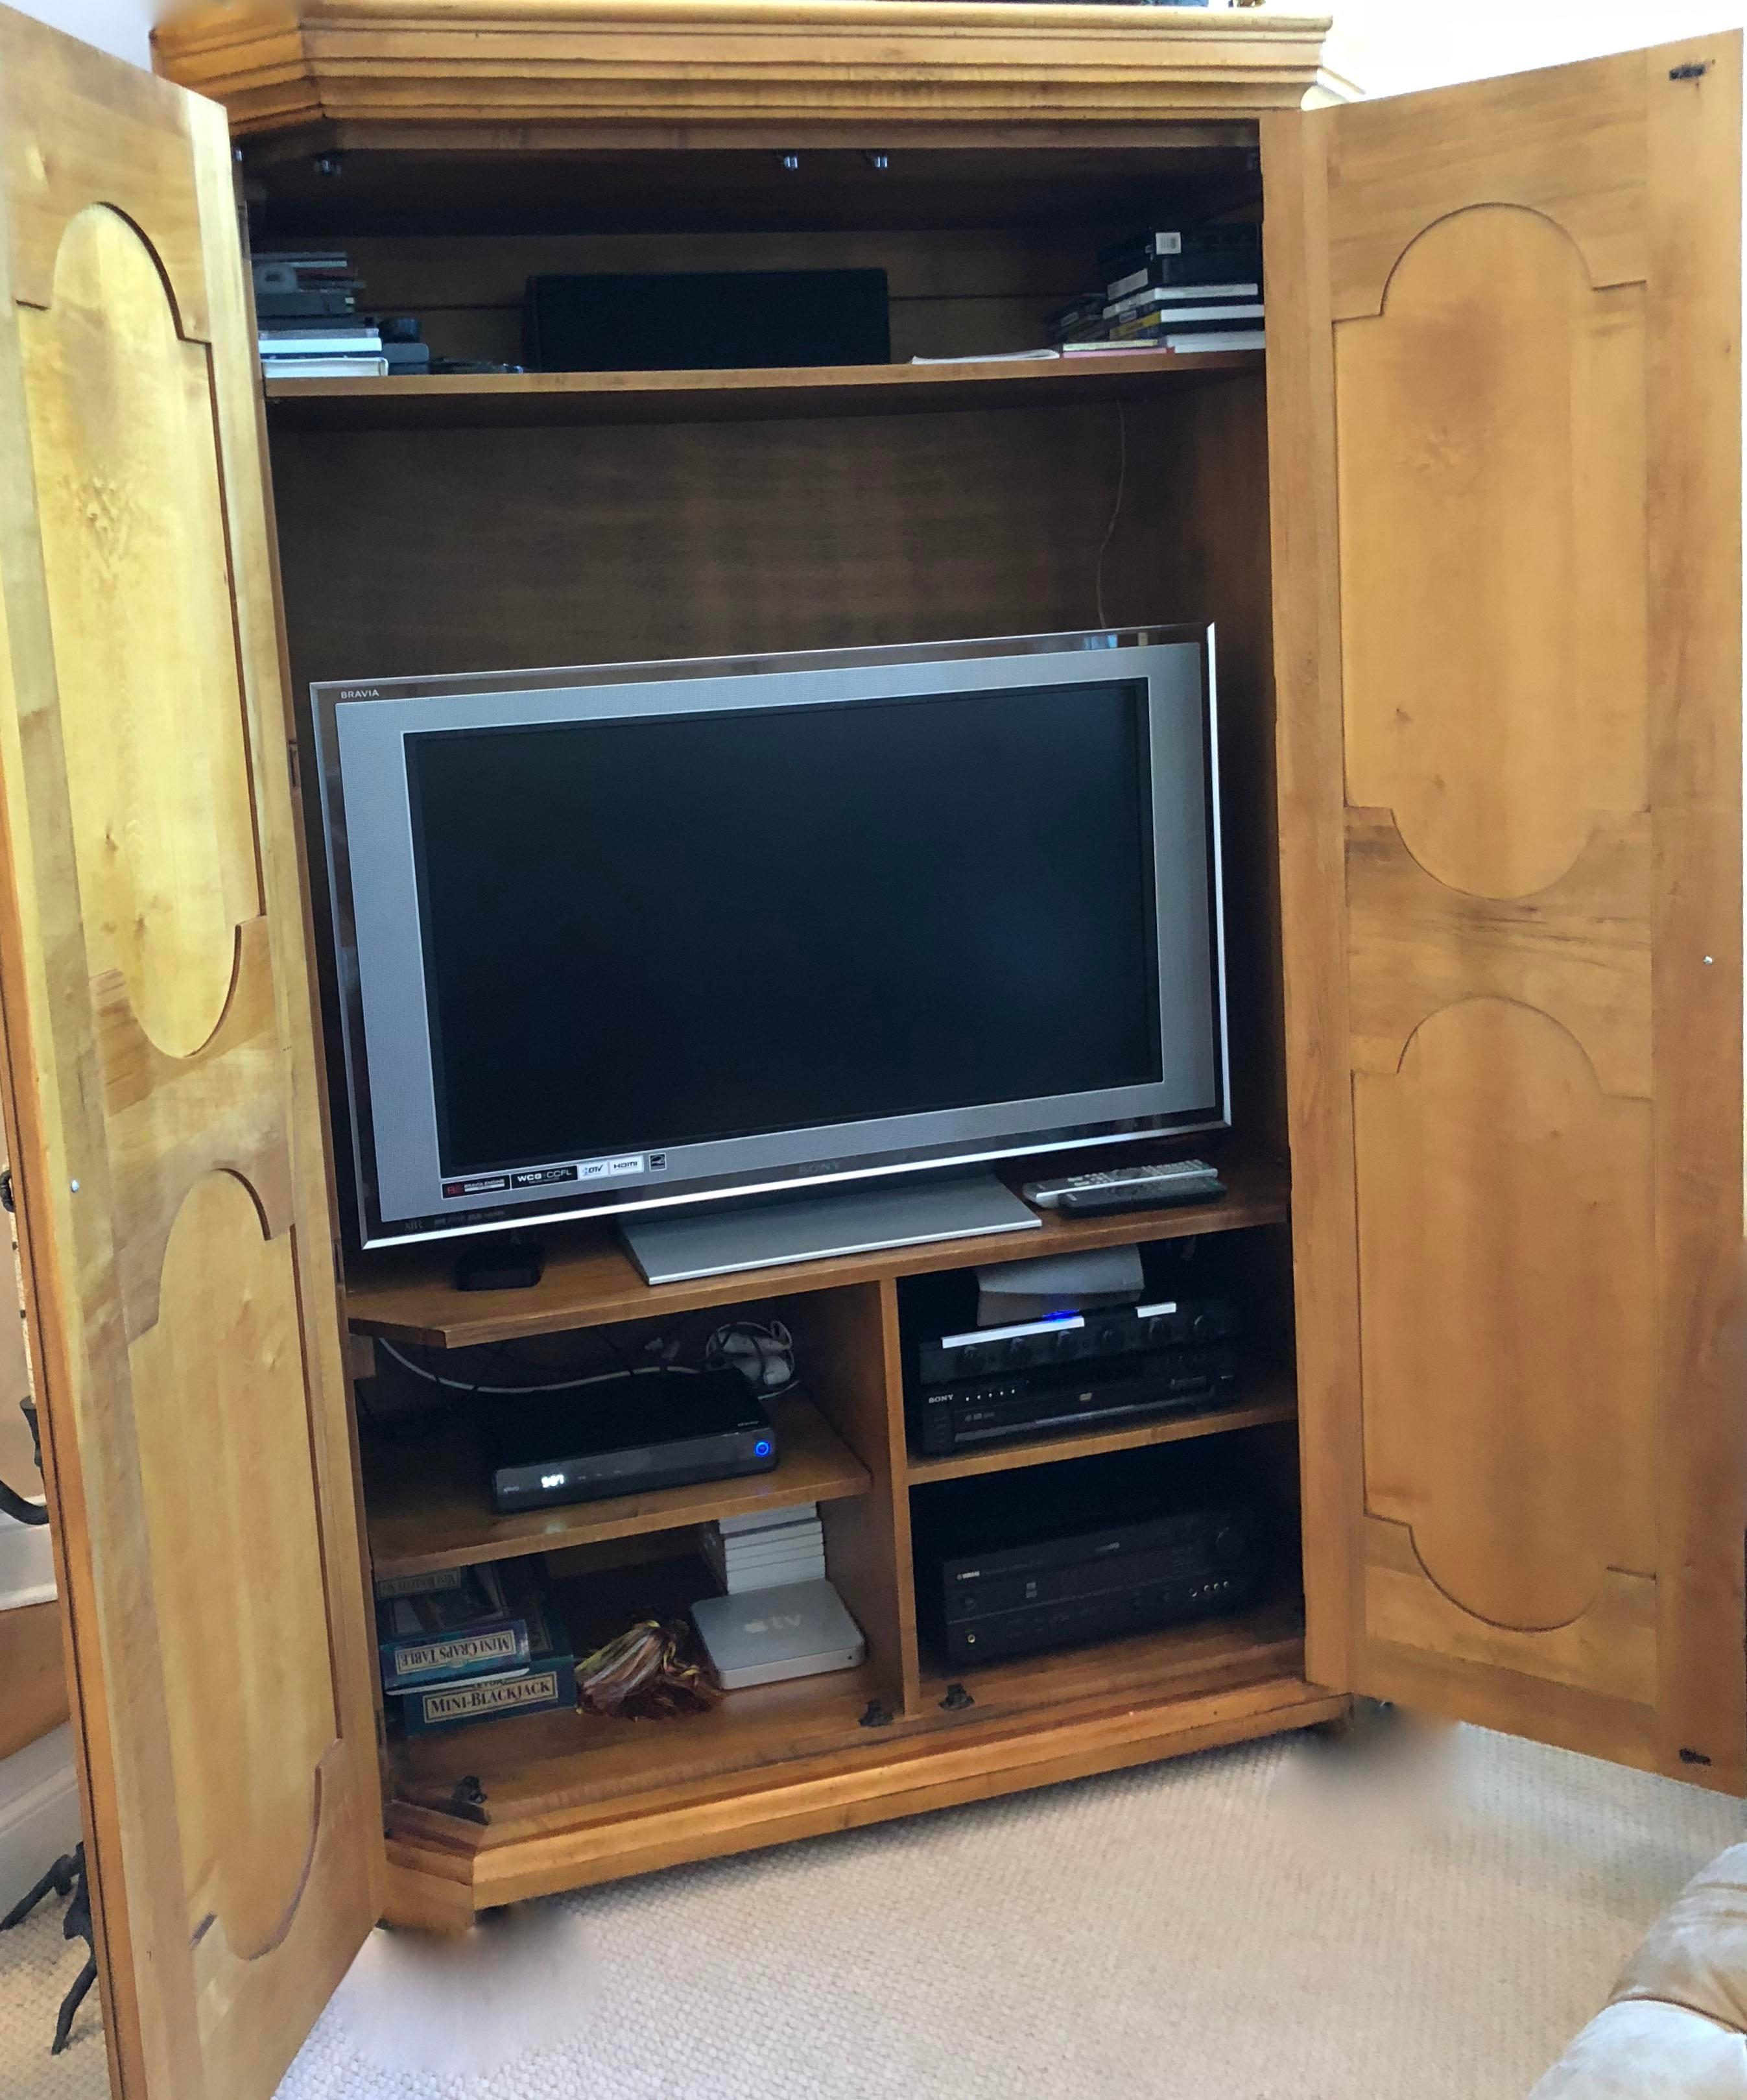 Romweber Romweber Furniture Armoire Tv Cabinet For Sale   Image 4 Of 12